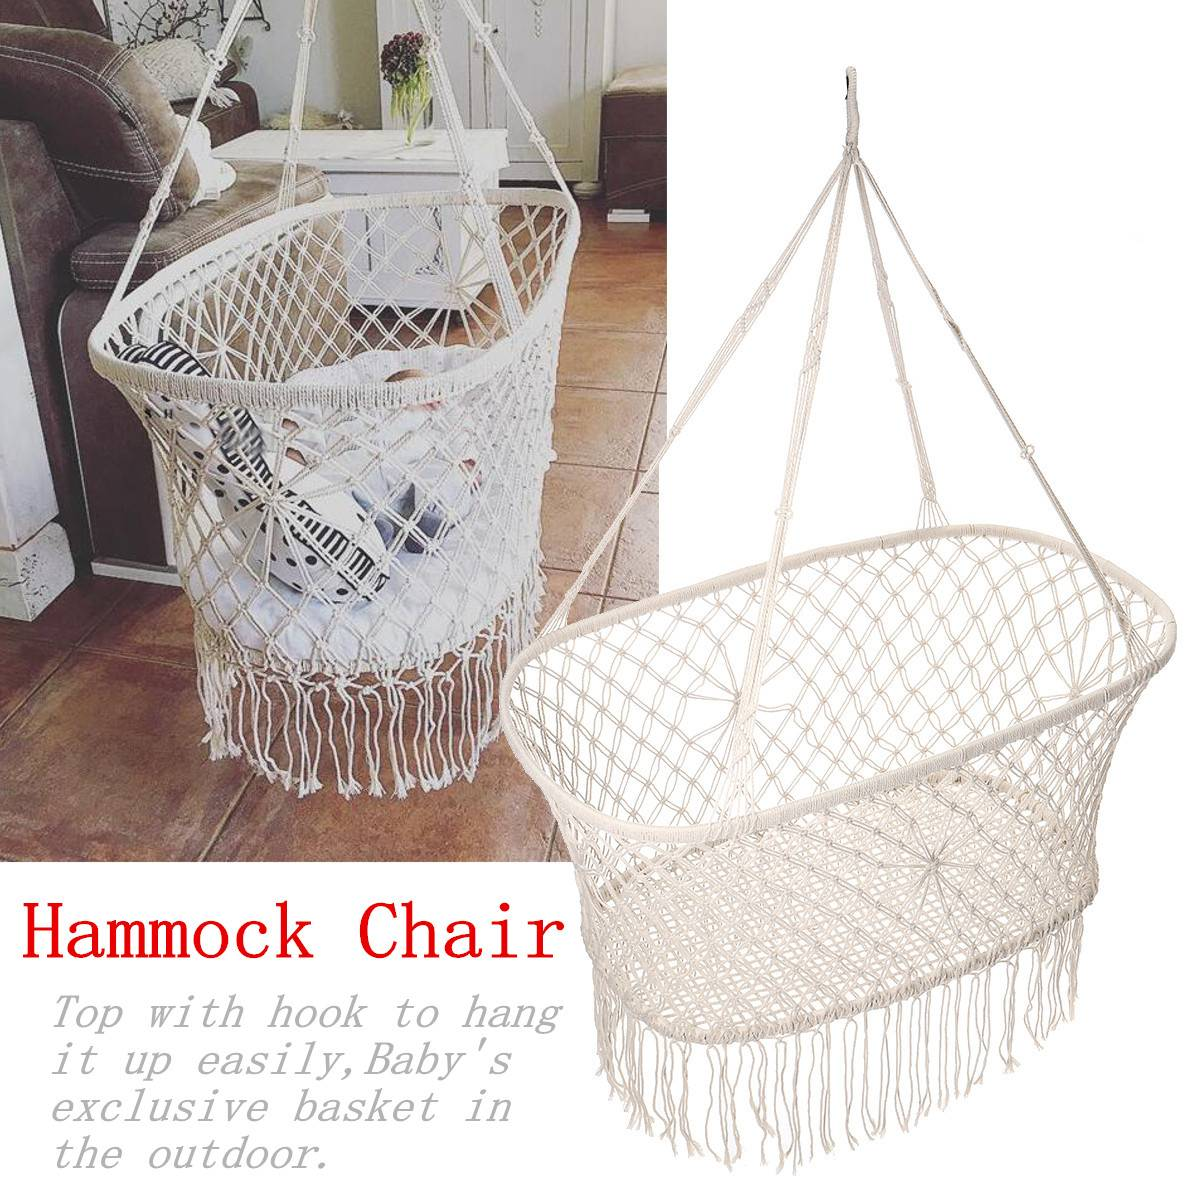 Cotton Rope Tassel Hammock Chair Swing Hammock Children Rocking Sleep Bed Indoor Outdoor Hanging Sest Child Swing Seat 1